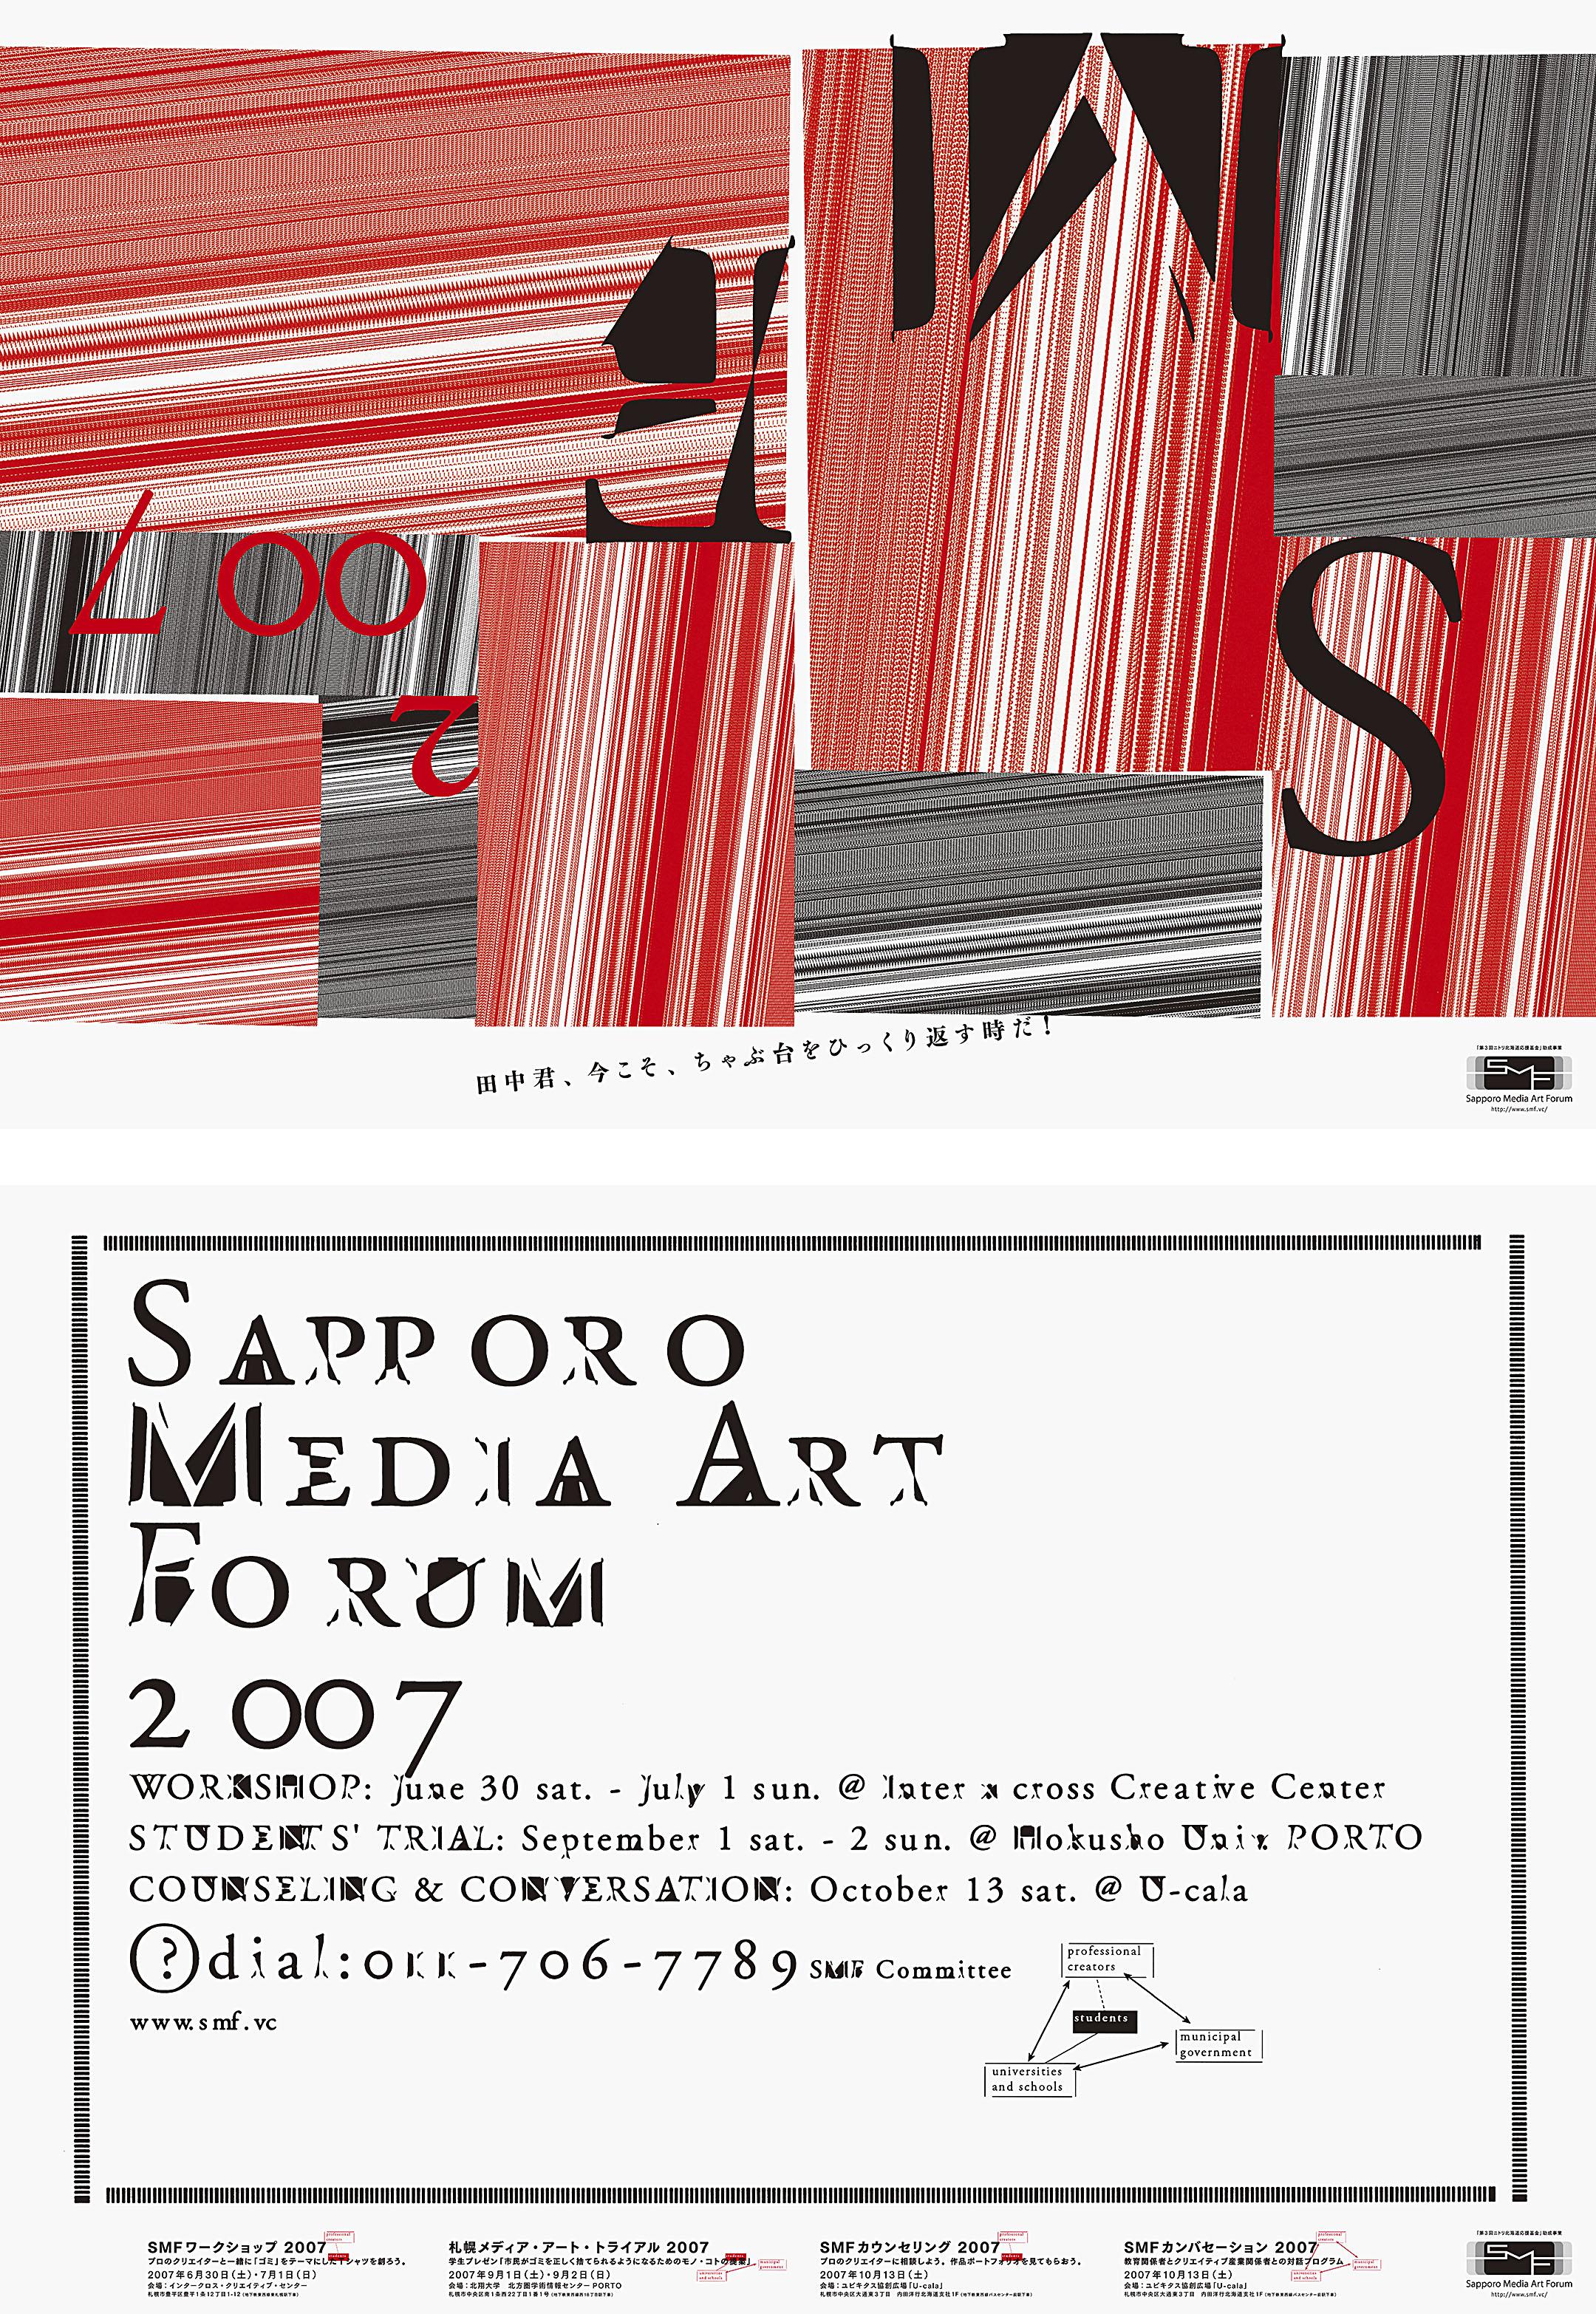 Sapporo Media Art Forum 2007